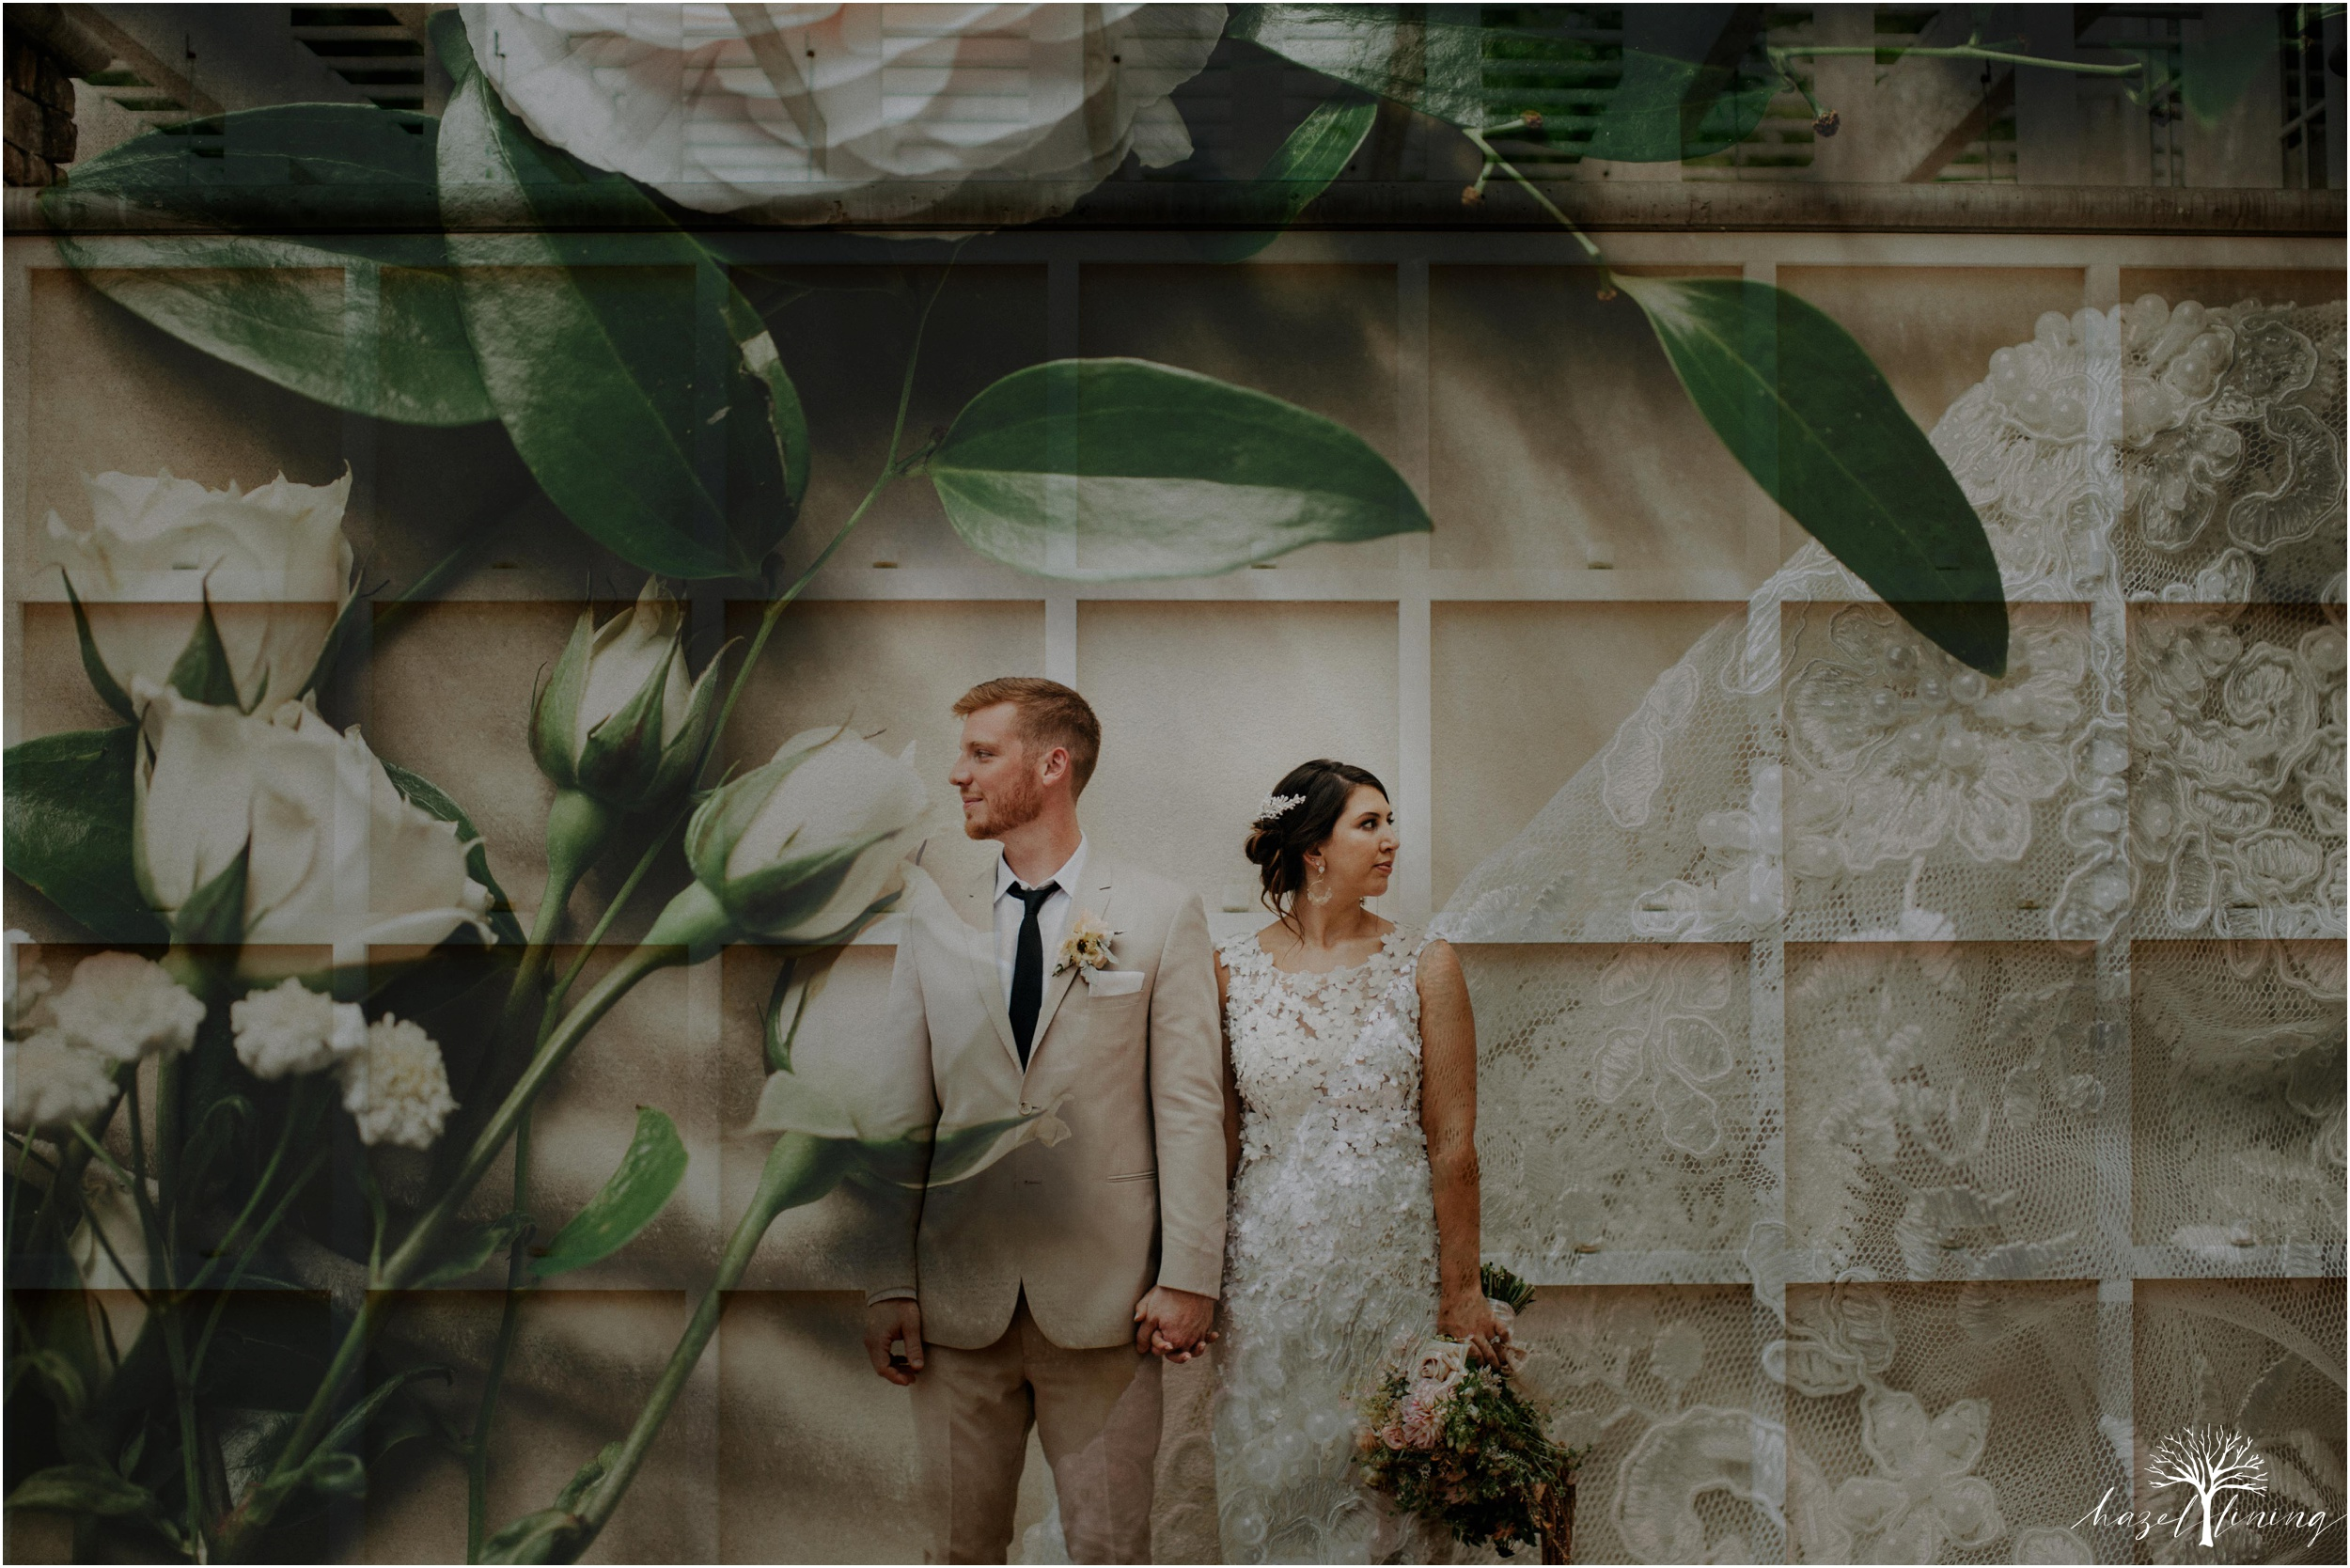 carl-chloe-the-ryland-inn-whitehouse-station-new-jersey-styled-squad-hazel-lining-photography-destination-elopement-wedding-engagement-photography_0032.jpg